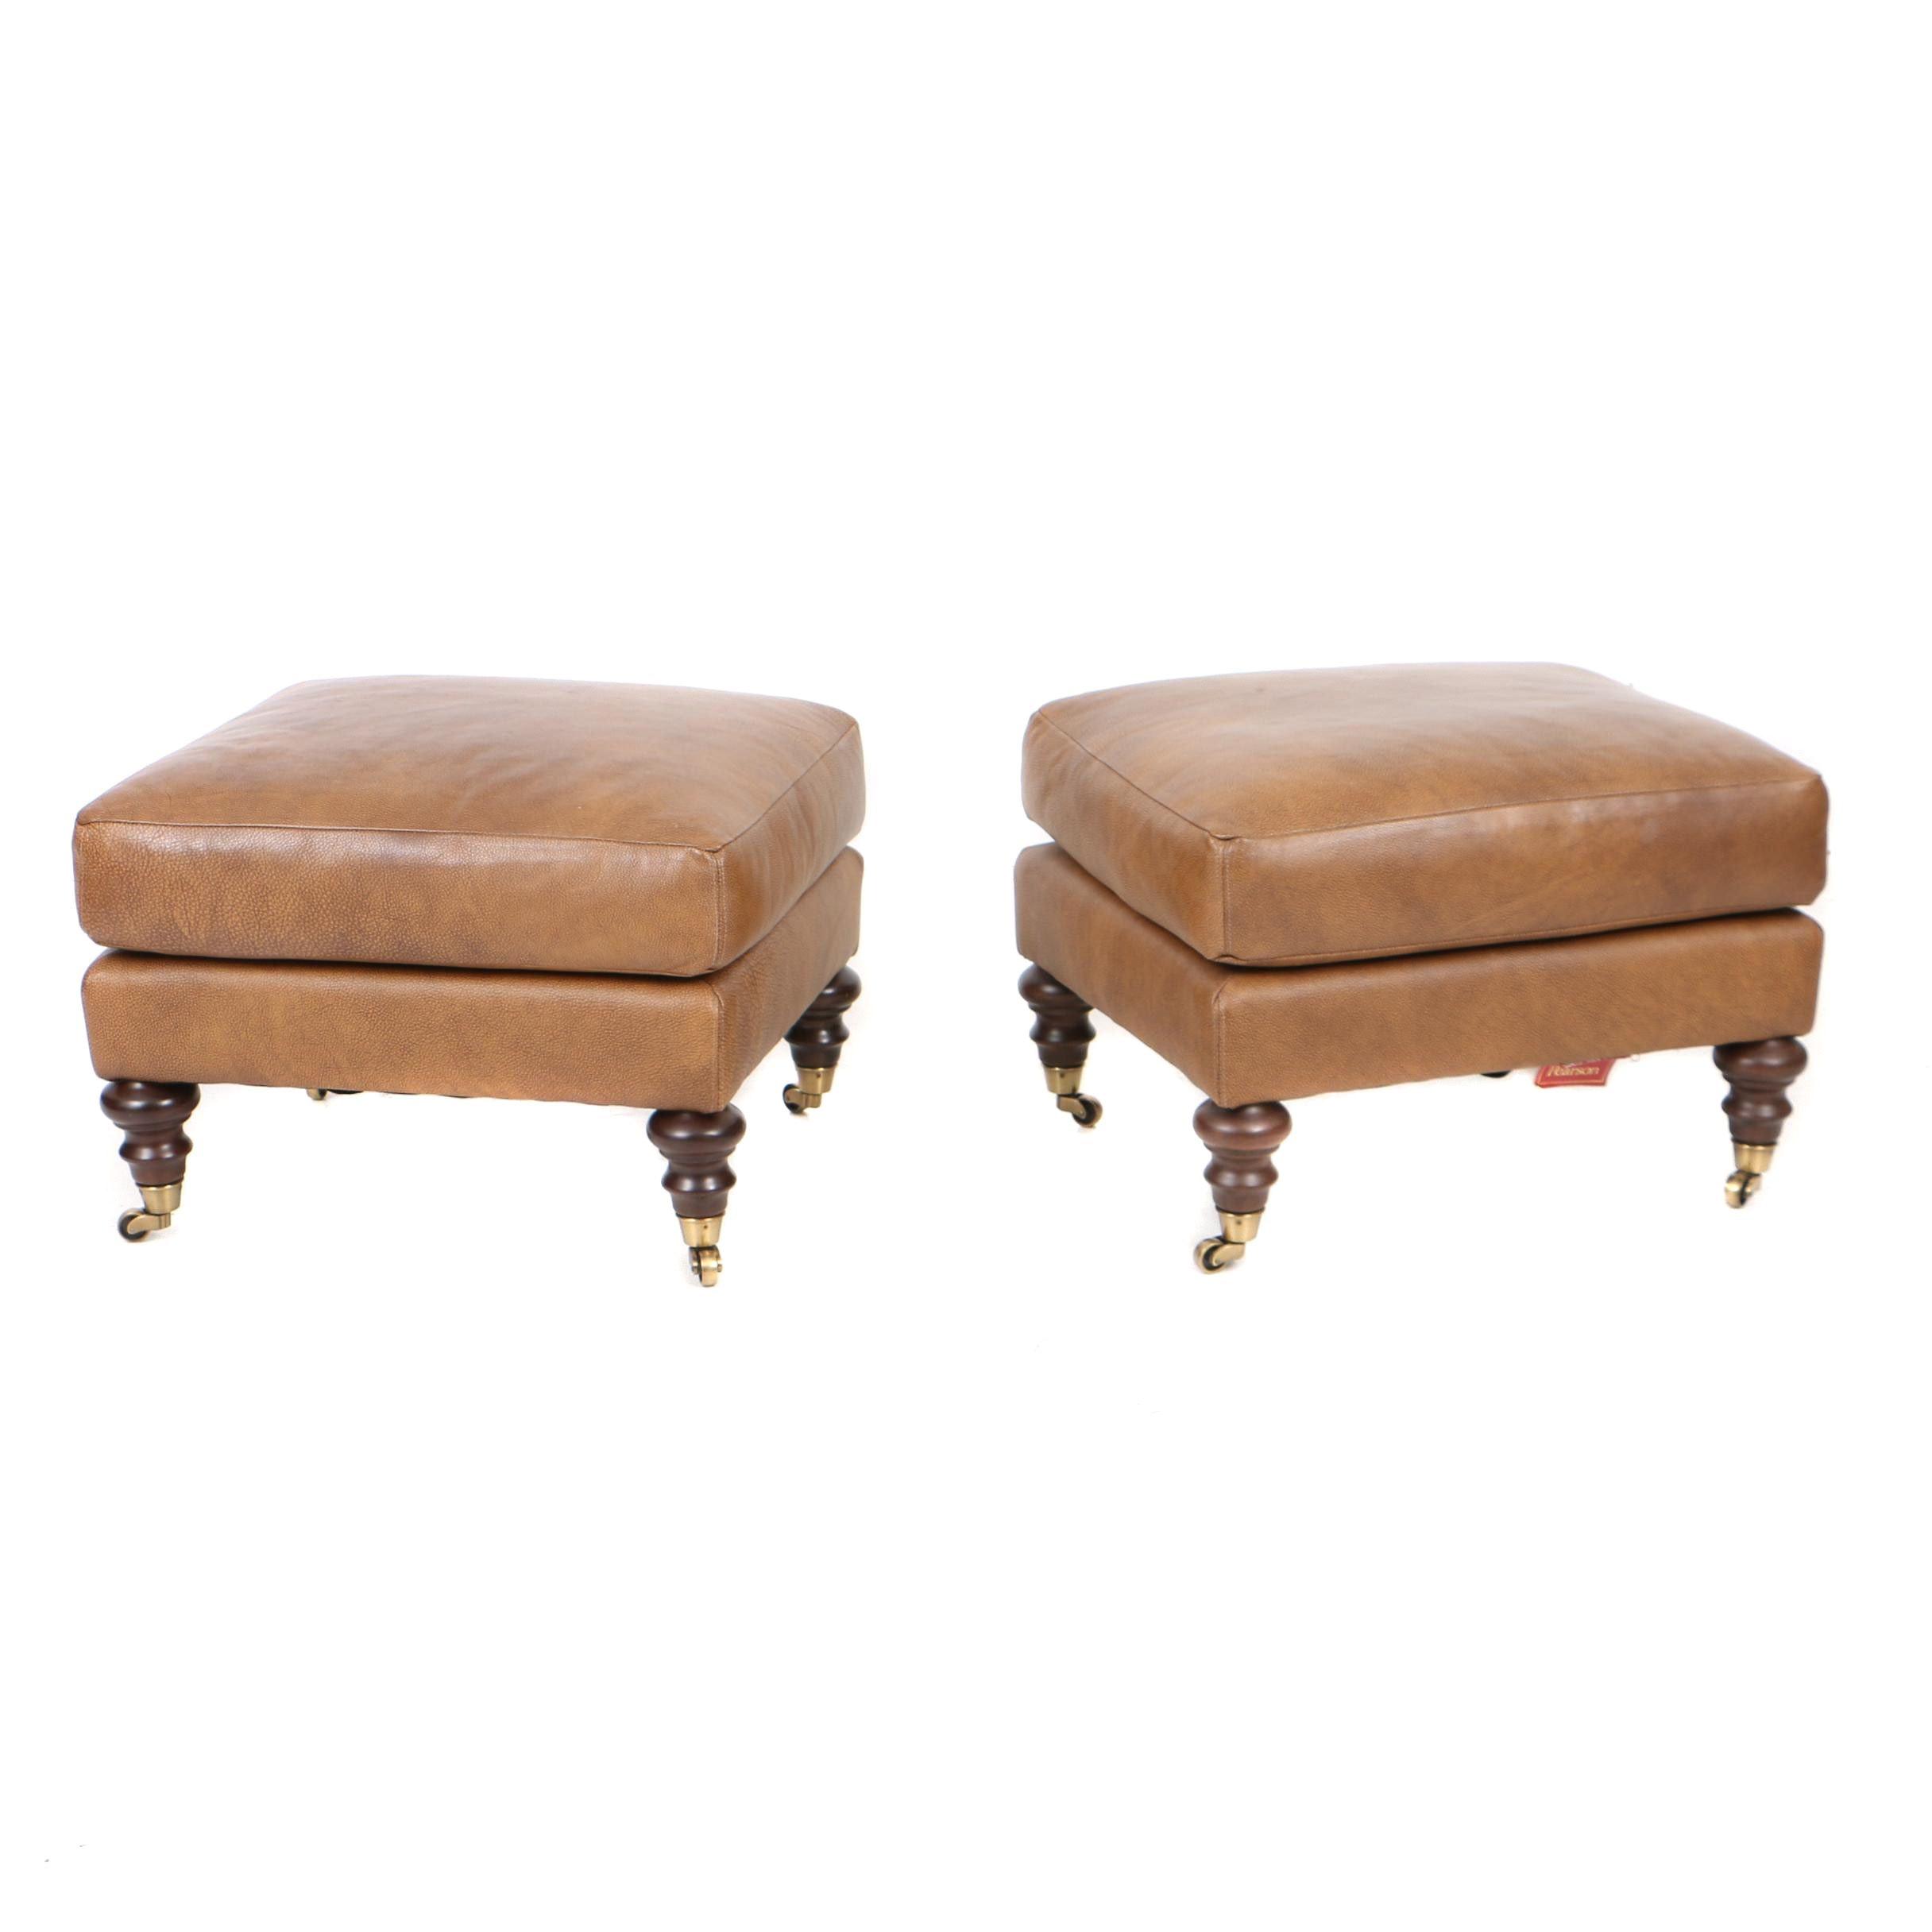 Pearson Furniture Faux-Leather Ottomans